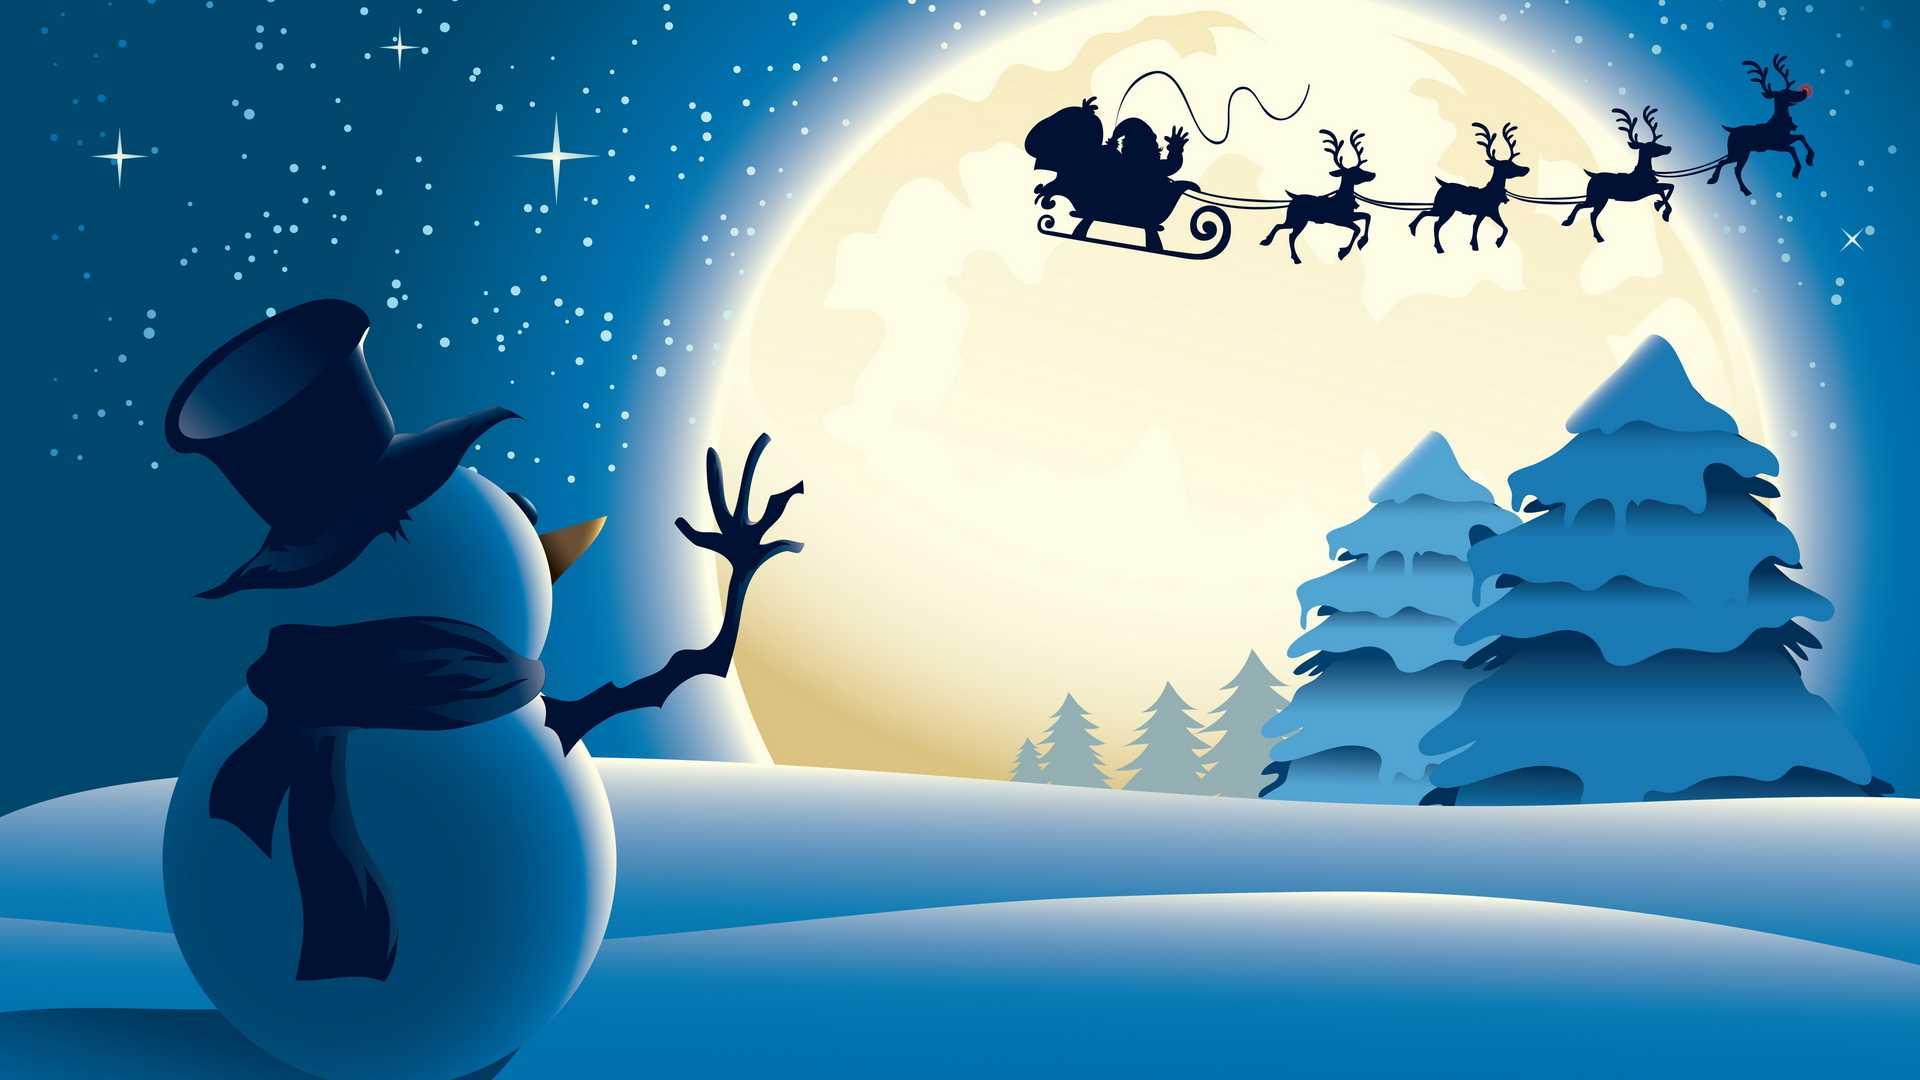 Снеговик и санта клаус